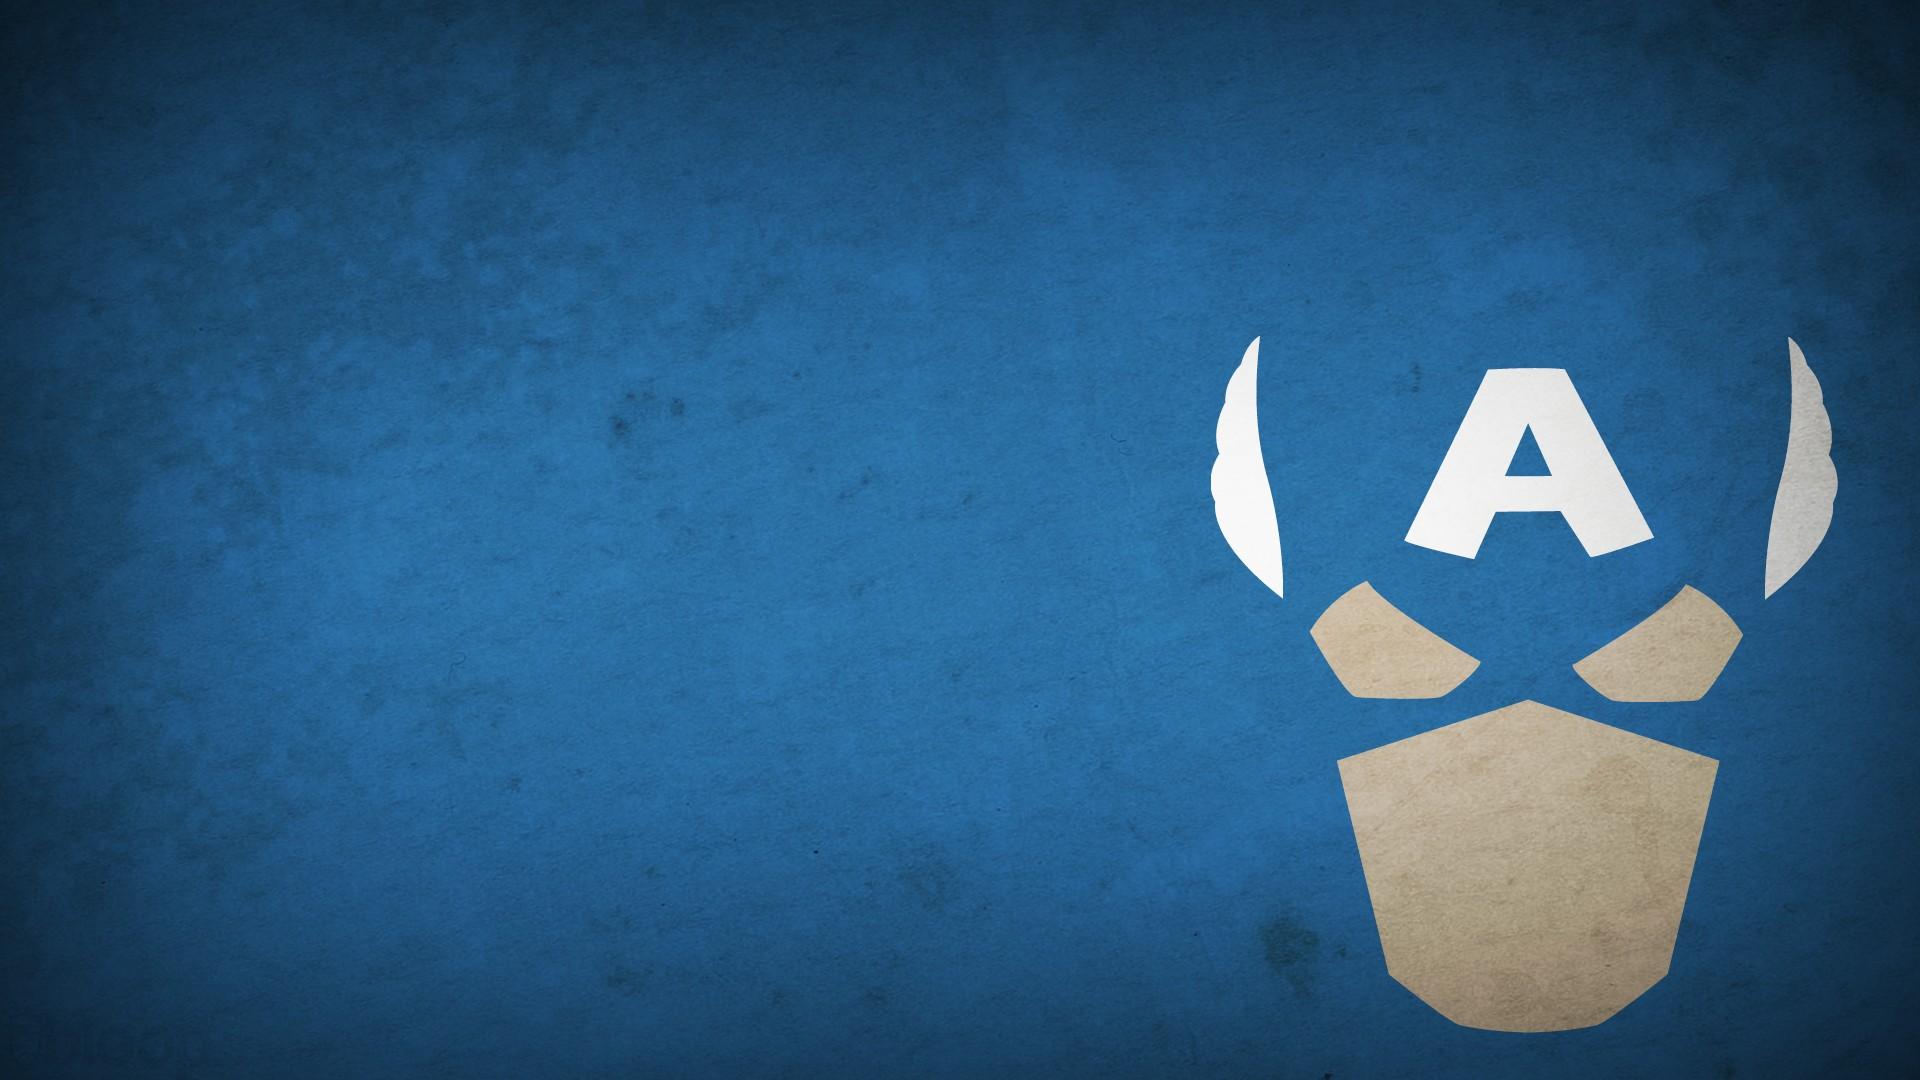 General 1920x1080 superhero Marvel Comics Marvel Heroes Captain America simple blue